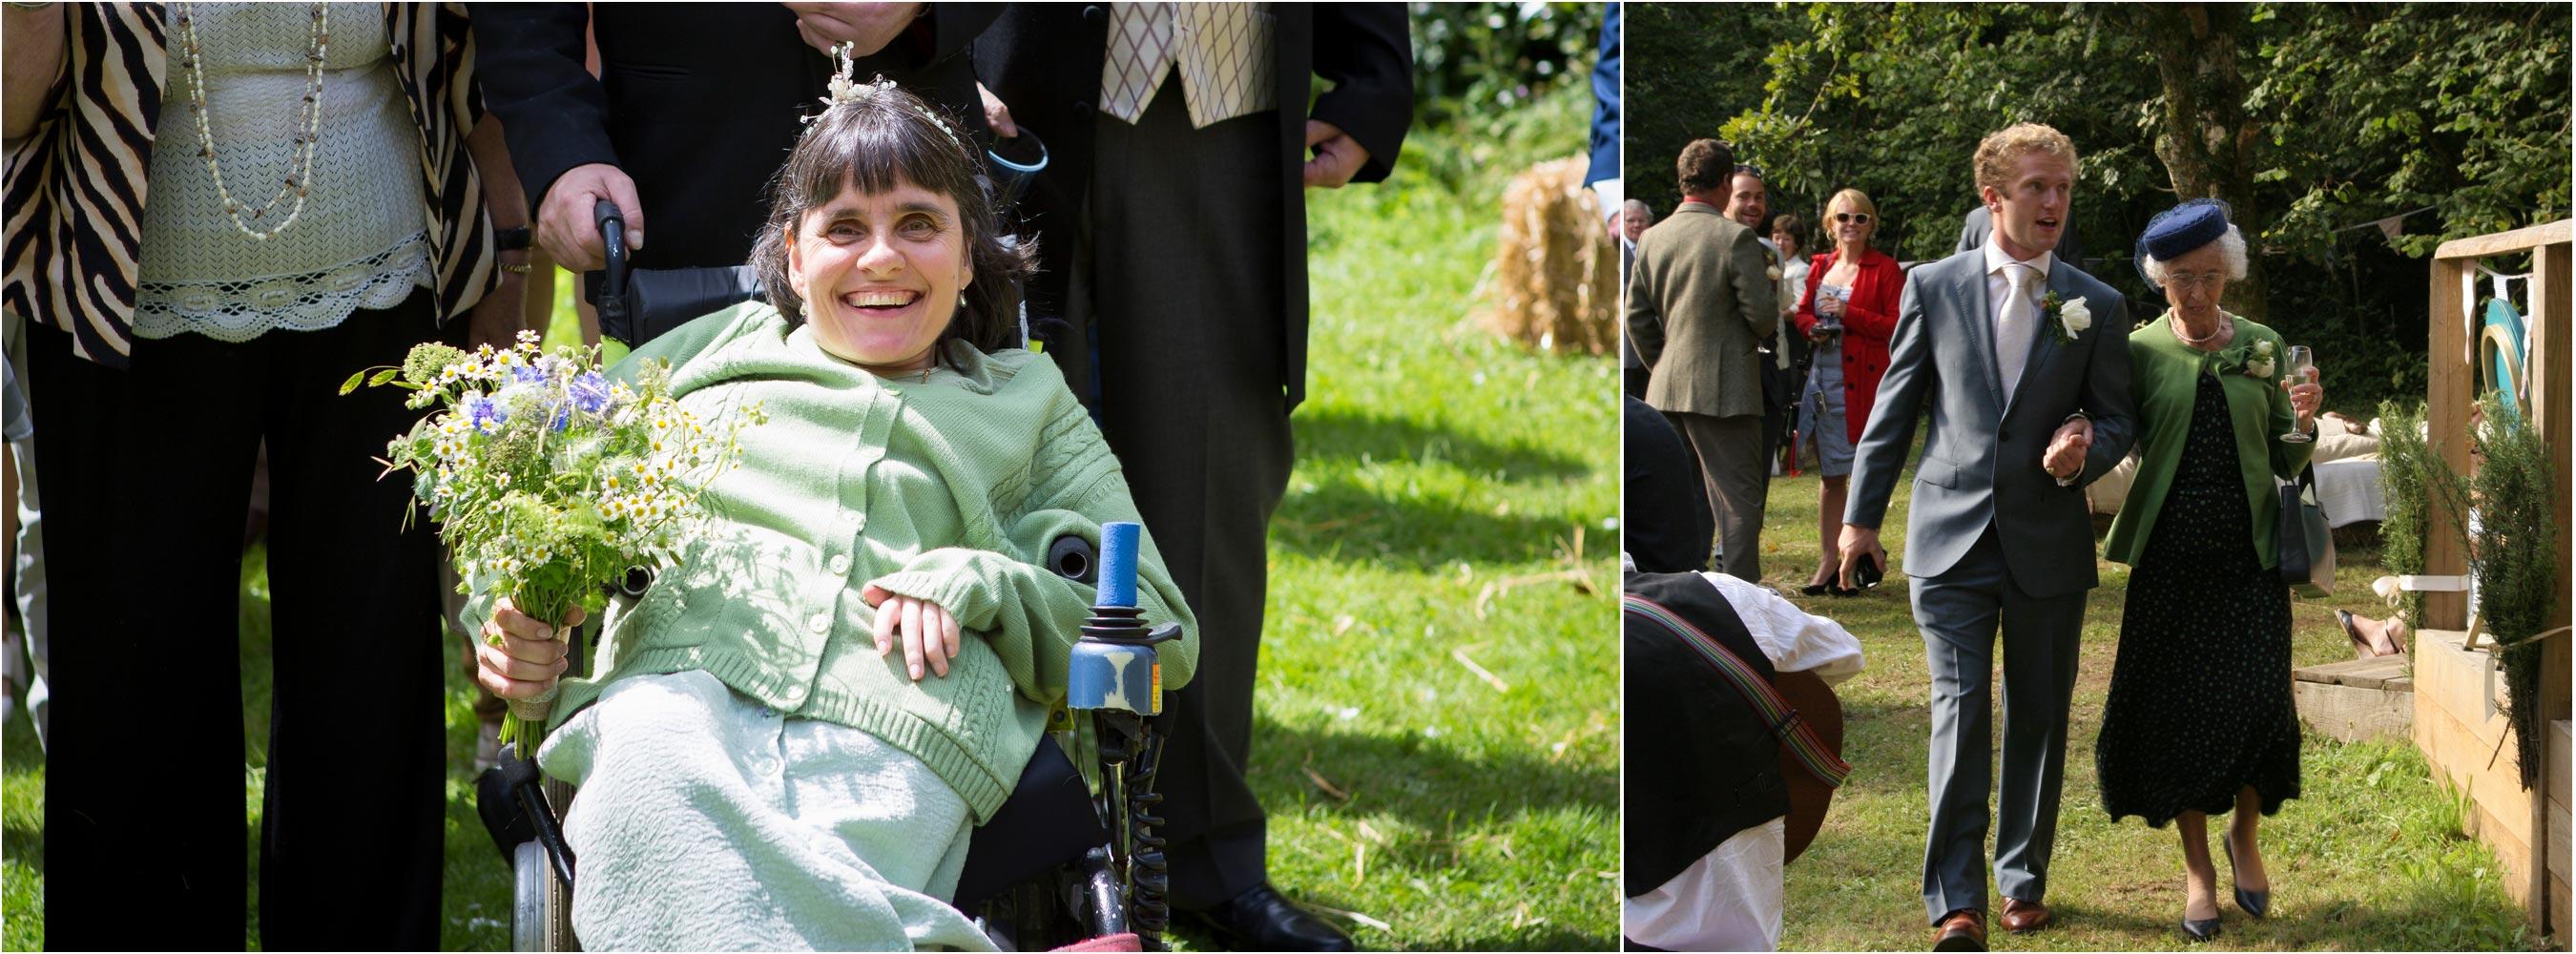 Wheelchair Happy Bridesmaid Jolly Green Granny